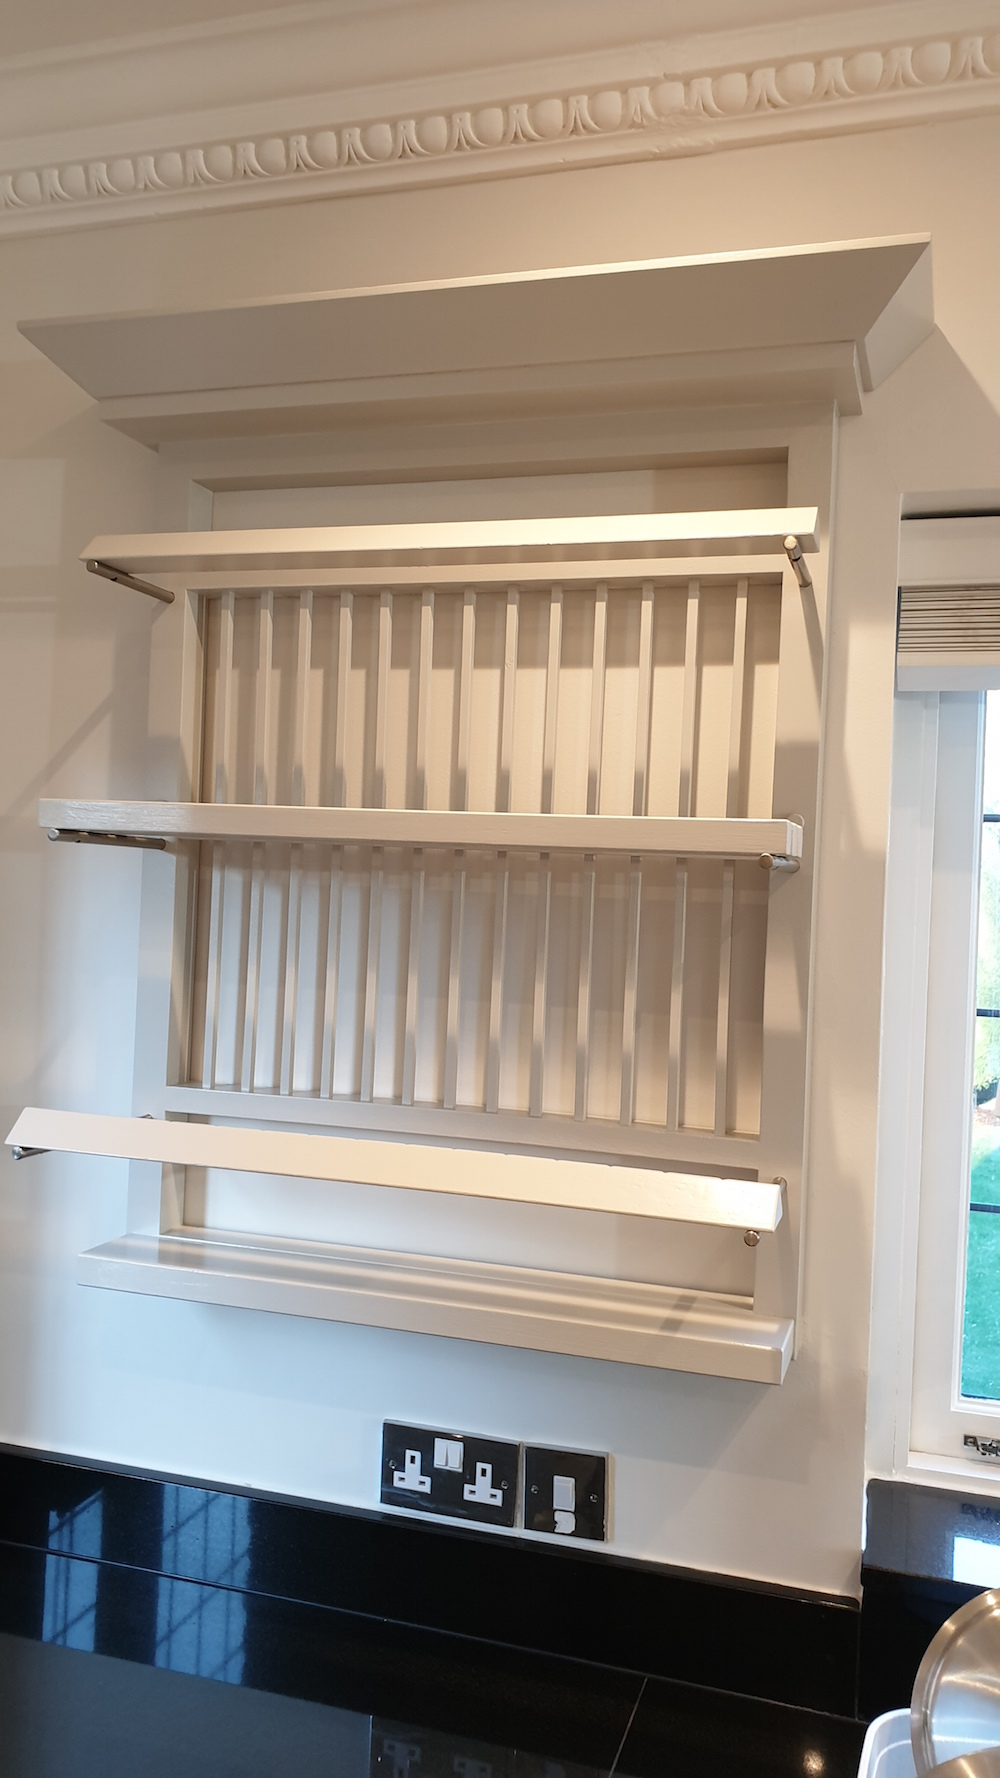 plate rack in bespoke wooden kitchen painted by Paul Barber in Radlett